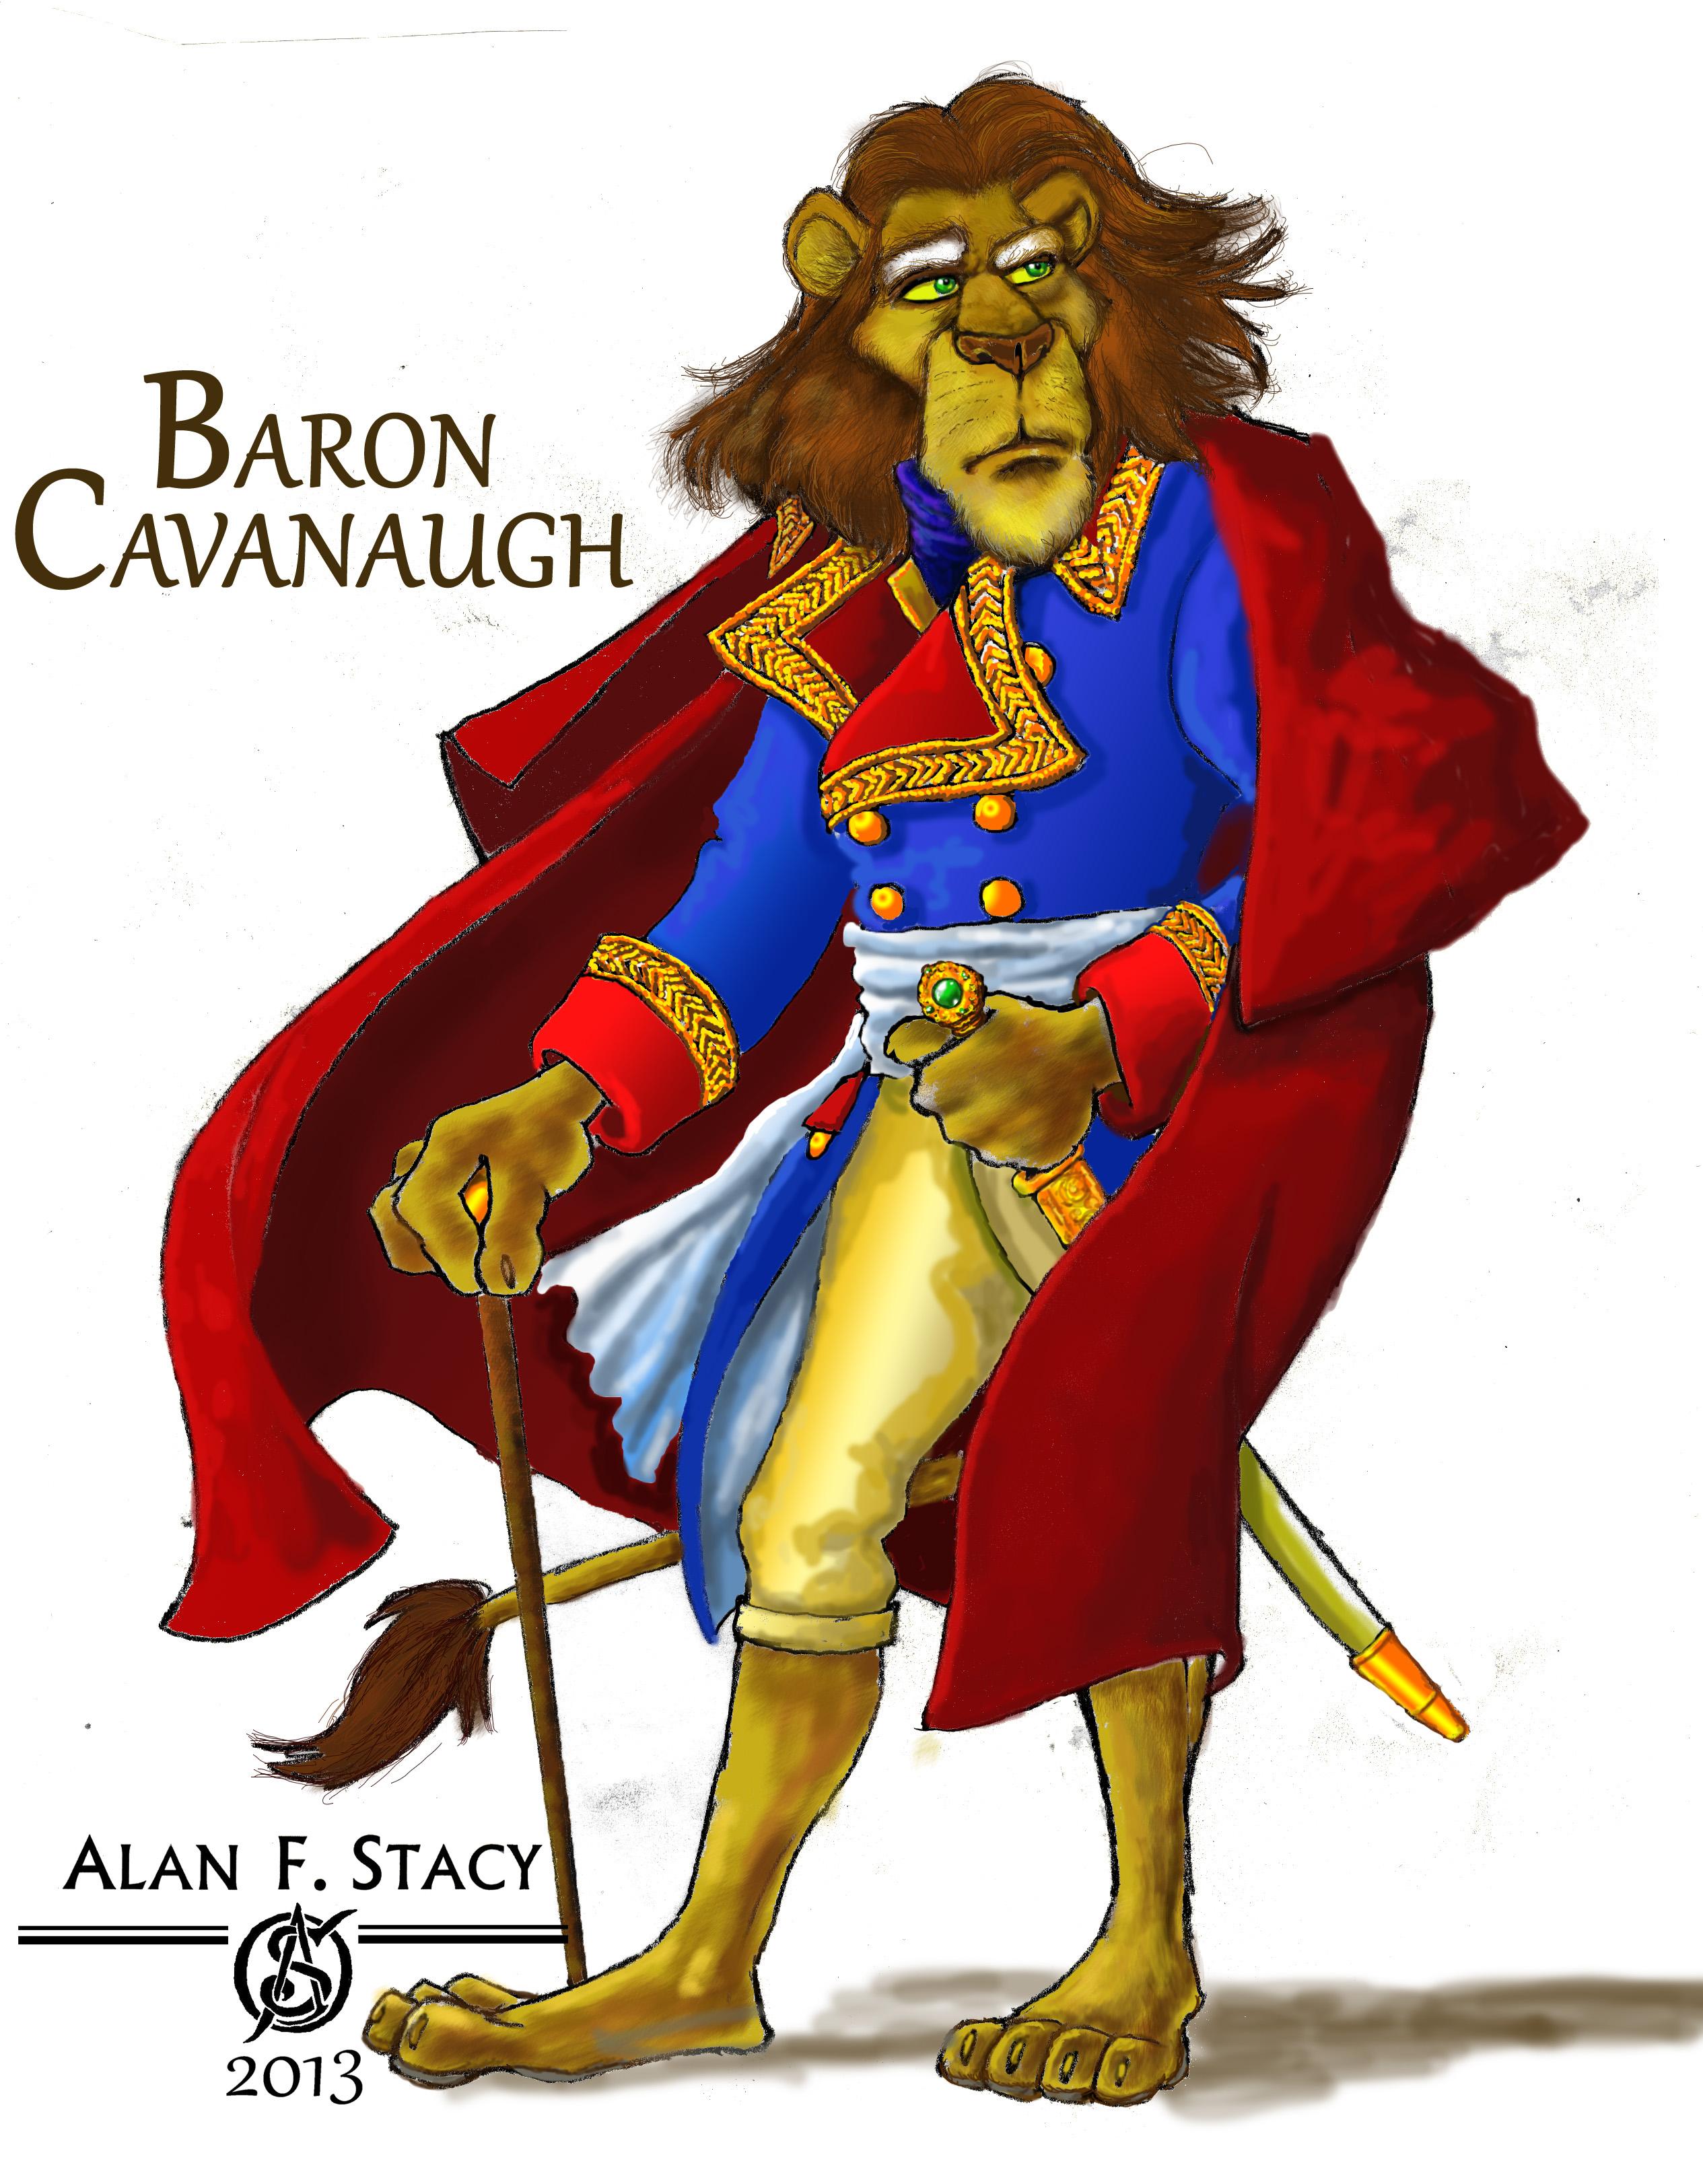 Day 2 -Baron Cavanaugh FINAL TITLE